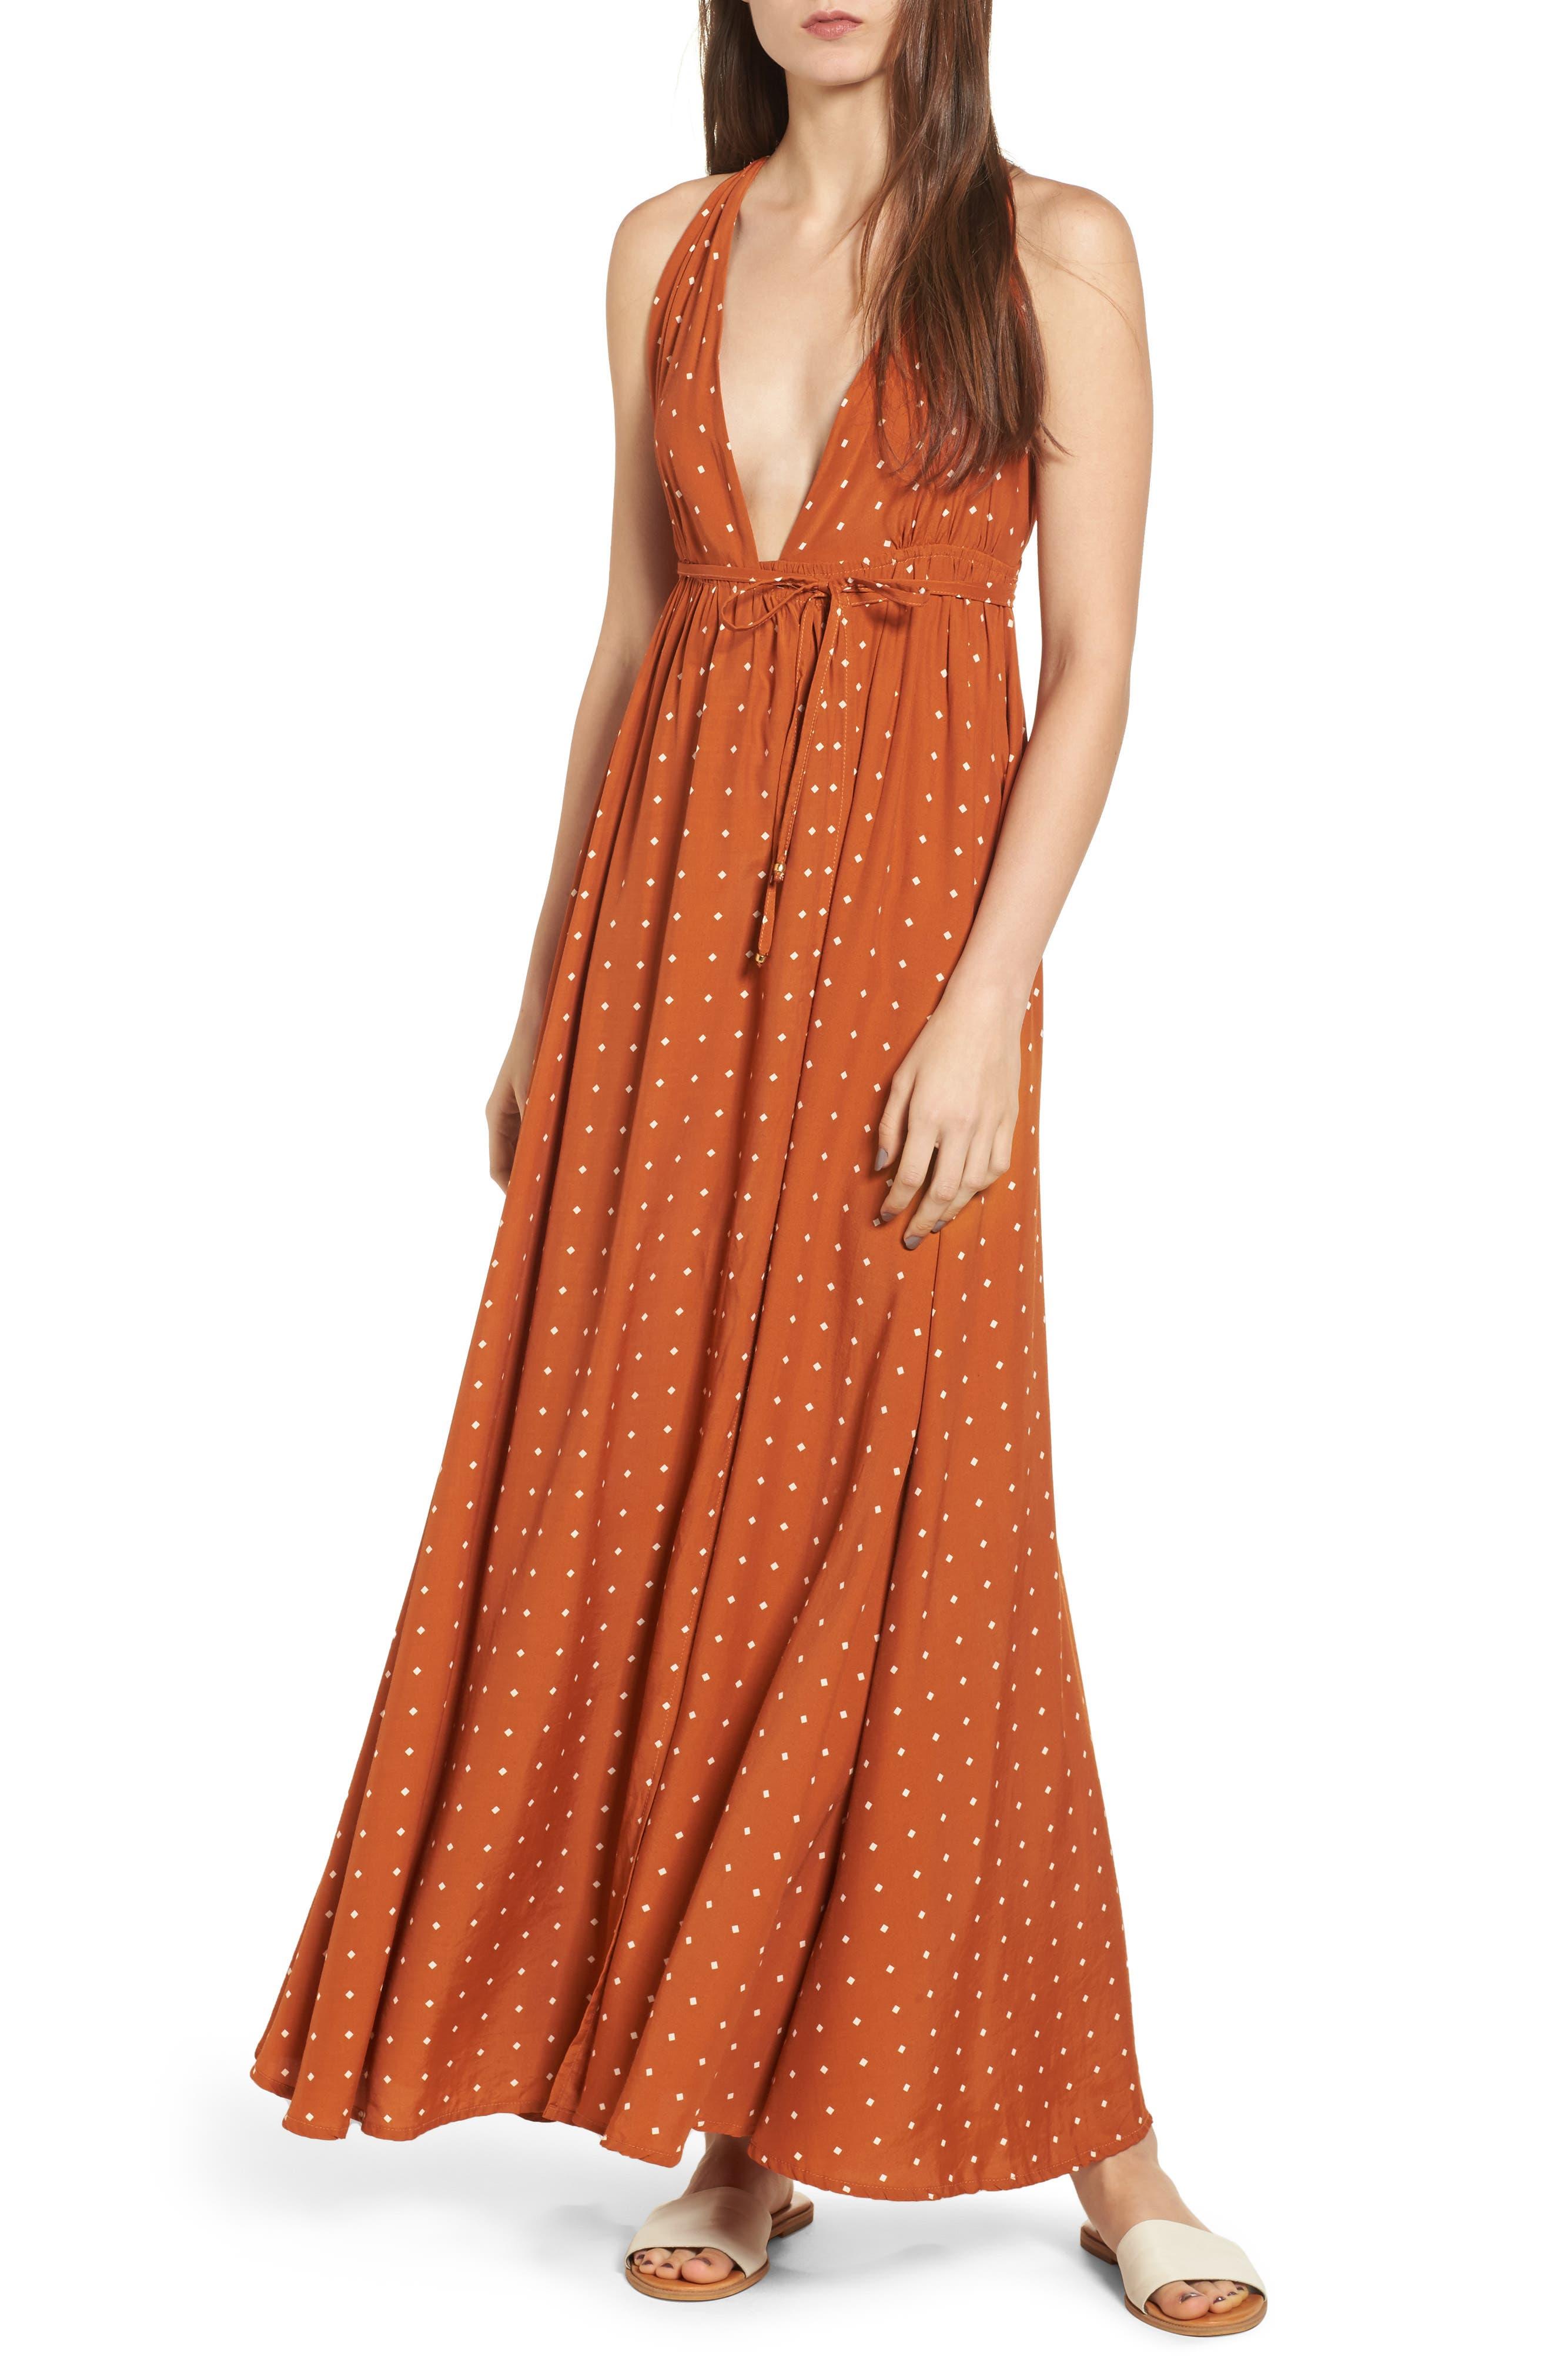 Santa Rosa Maxi Dress,                         Main,                         color, Stefano Print - Ginger